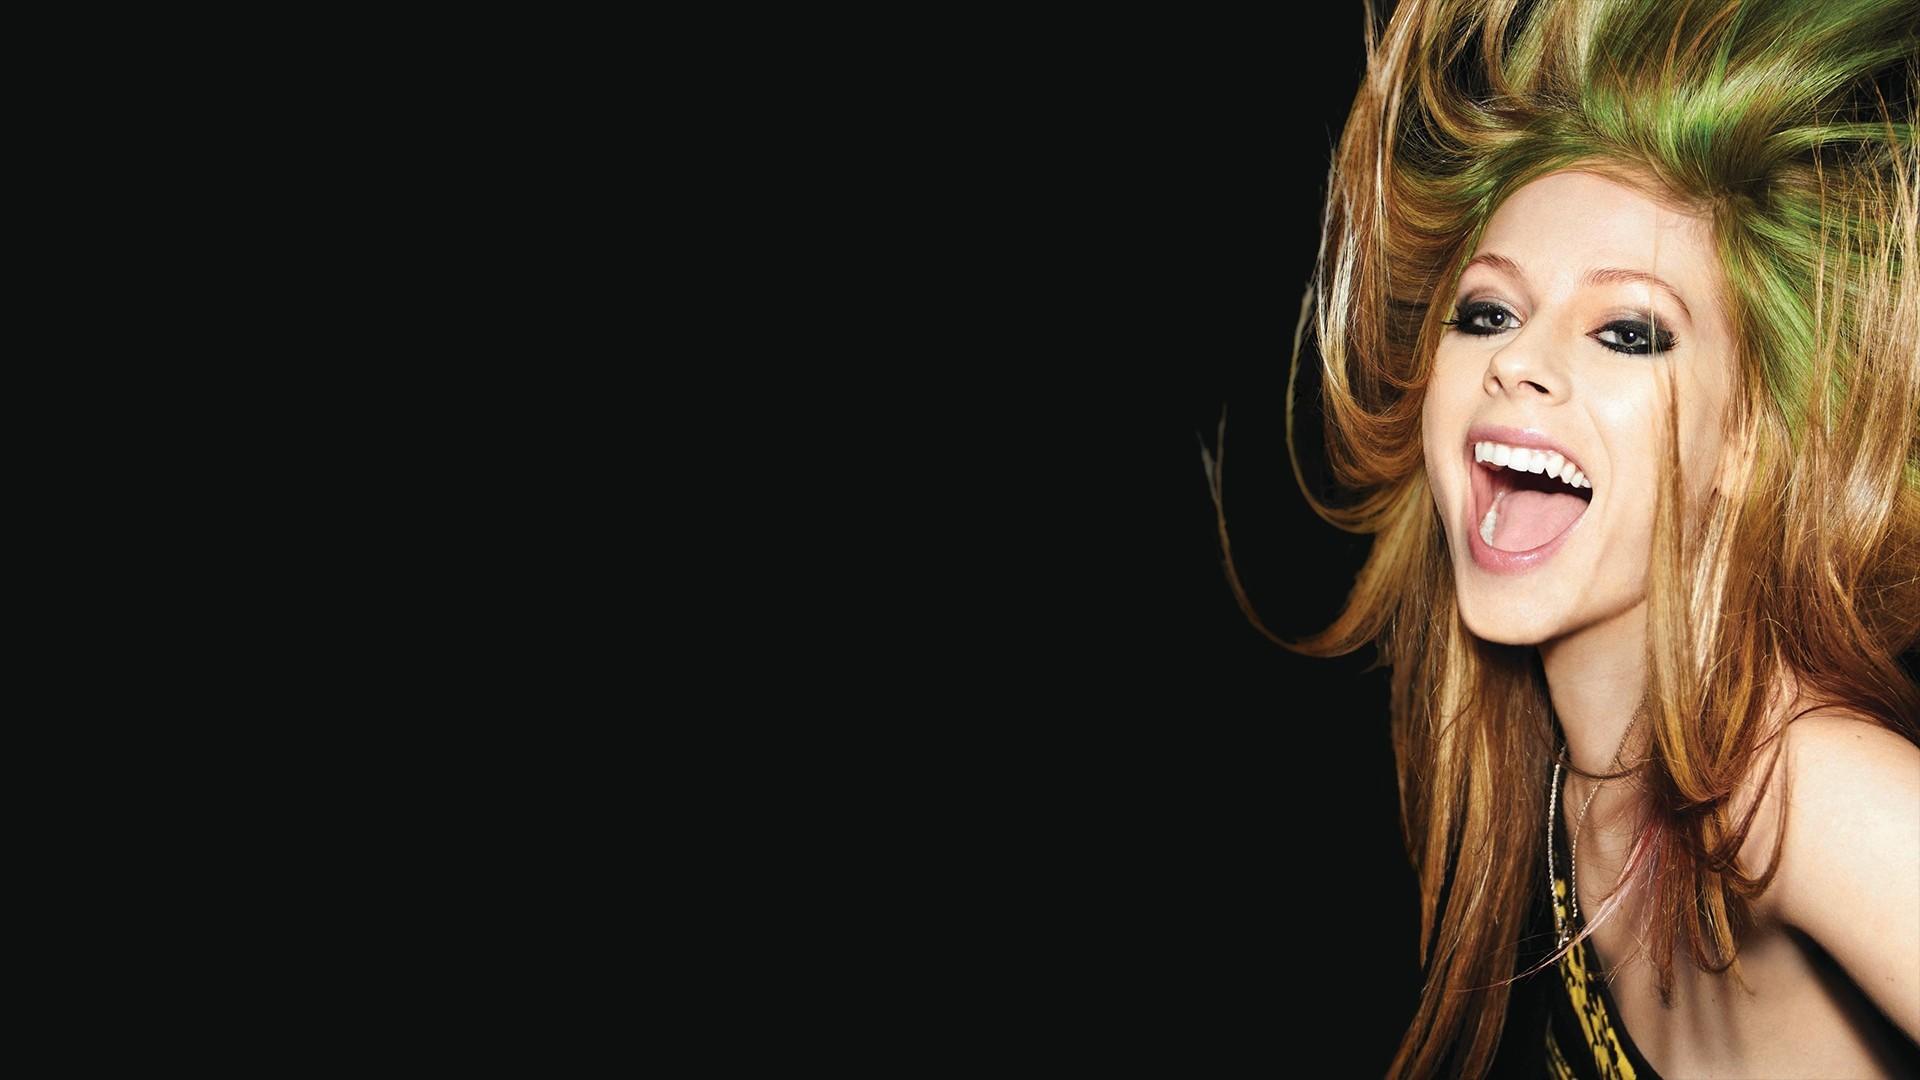 Avril Lavigne Background images